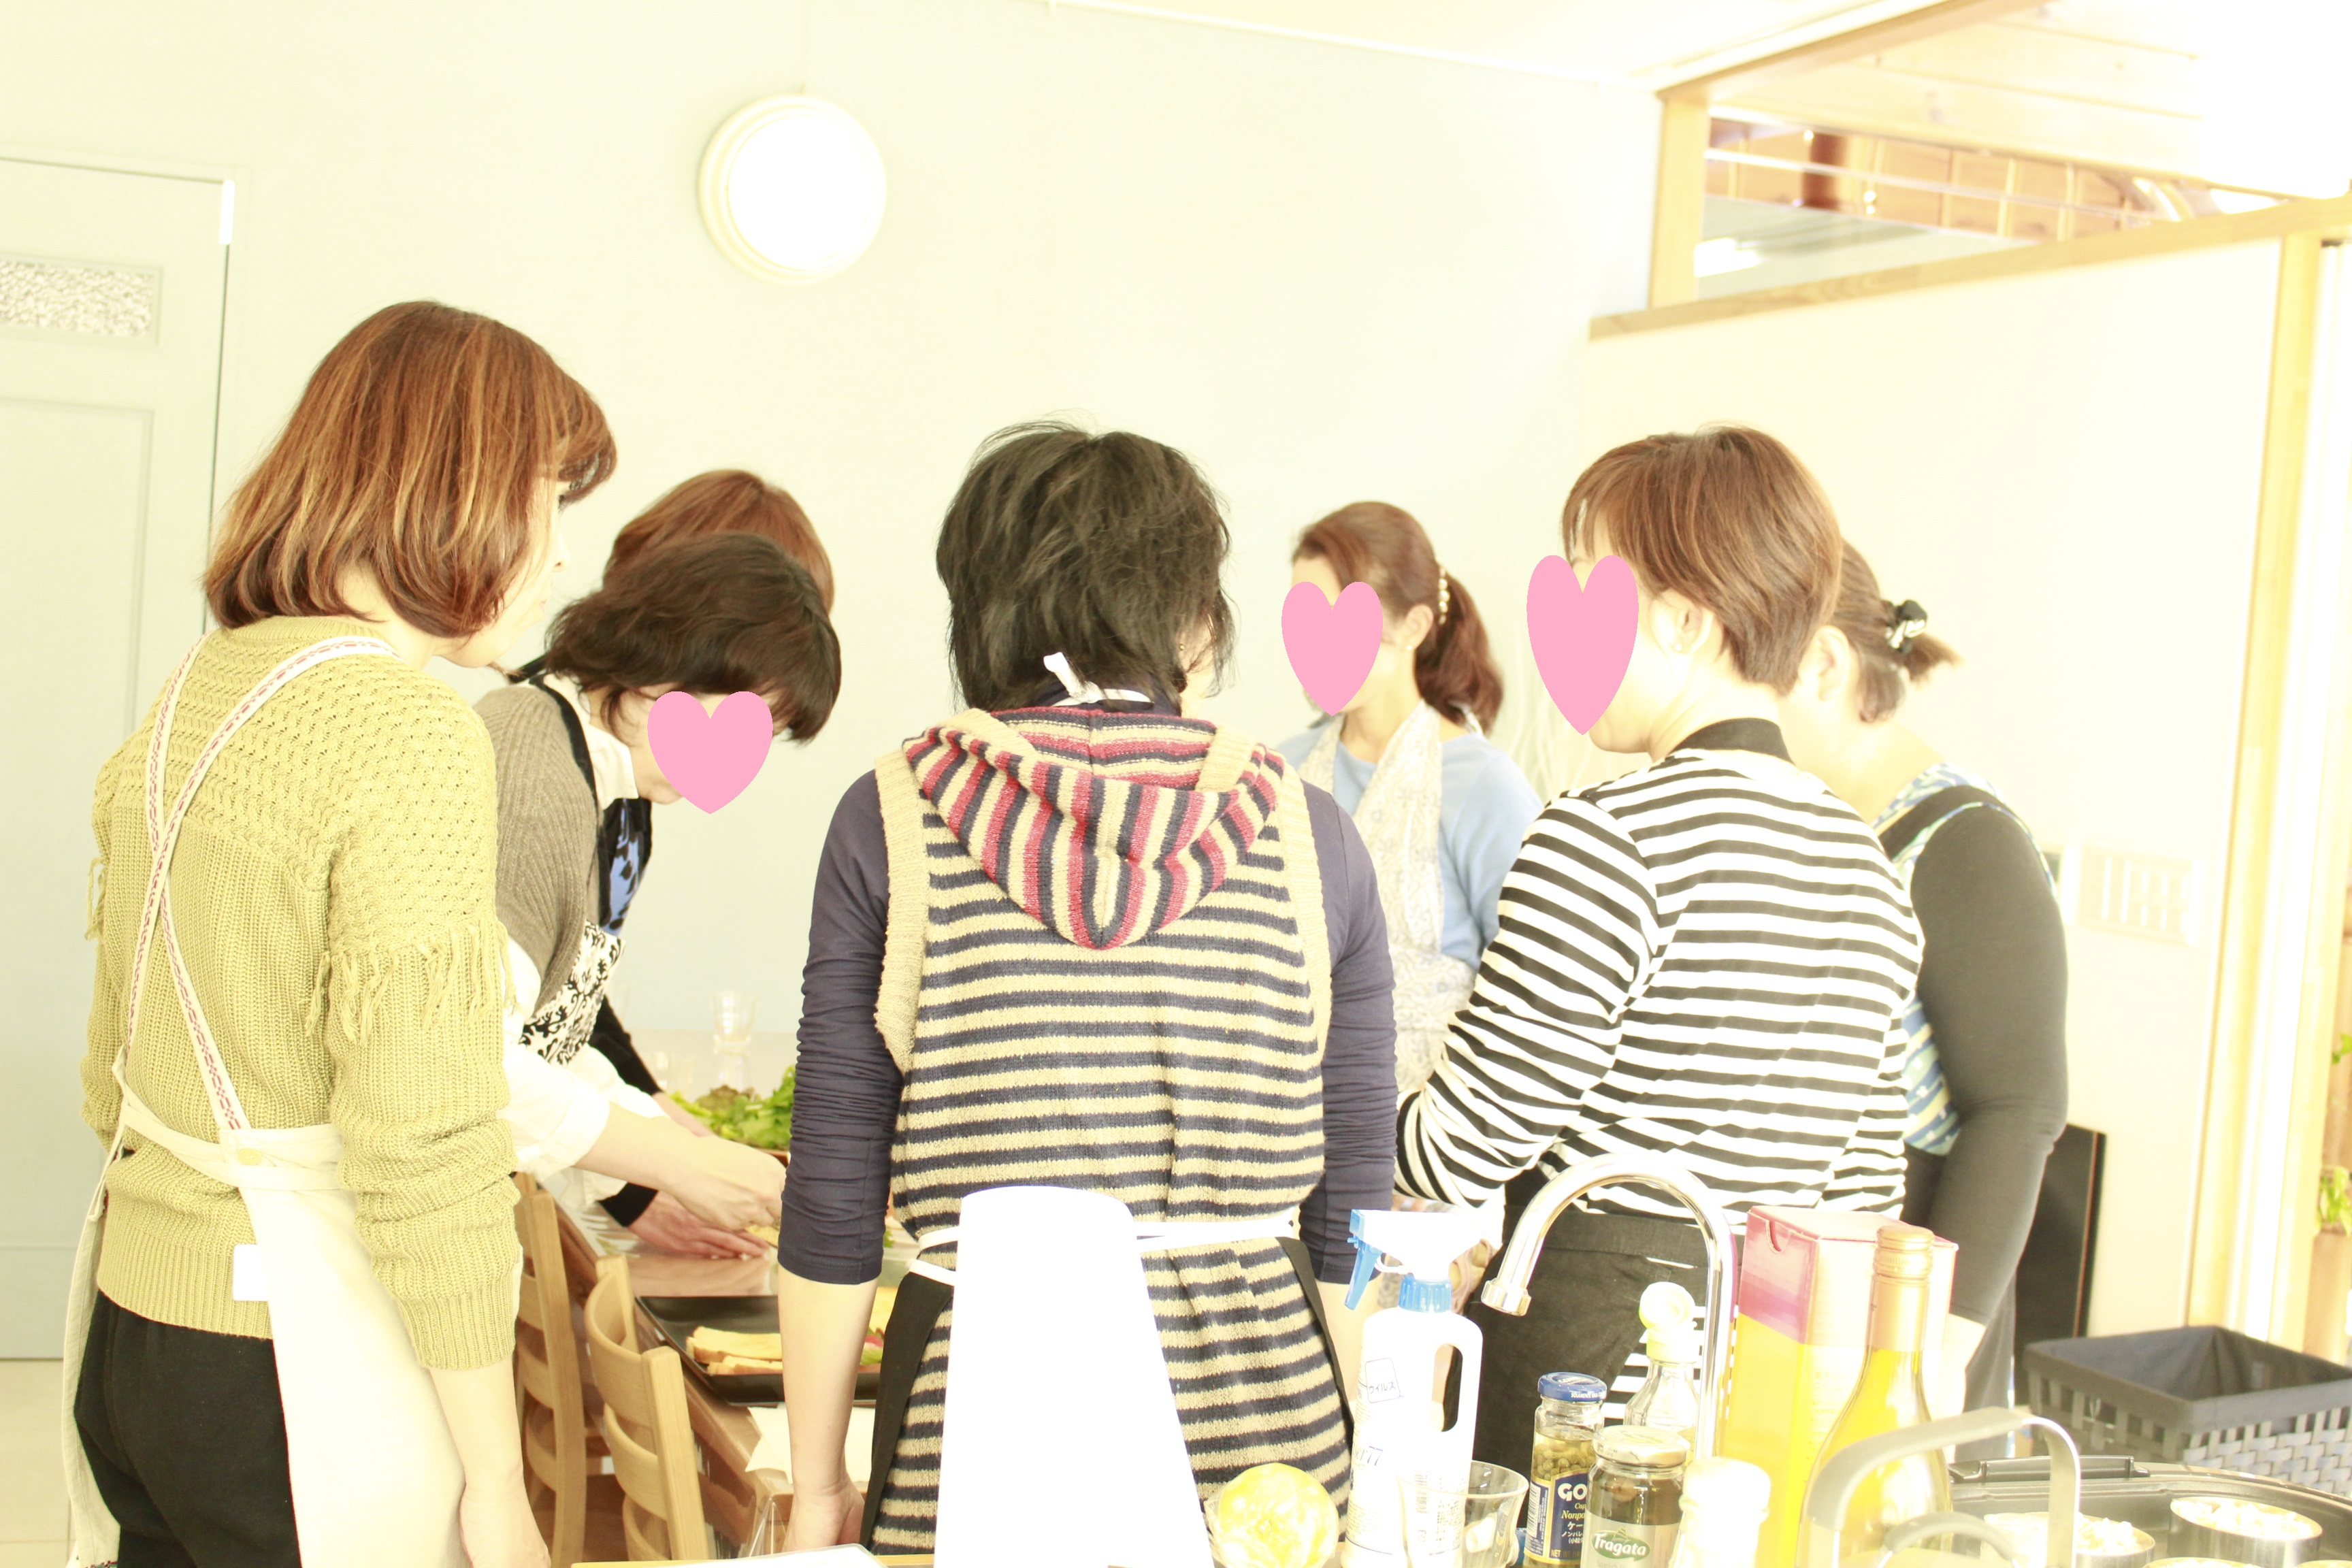 a-ta-sante糖質制限パン料理教室。12月糖質制限家庭料理2日目。『グルテンフリーのXmasパーティー料理』